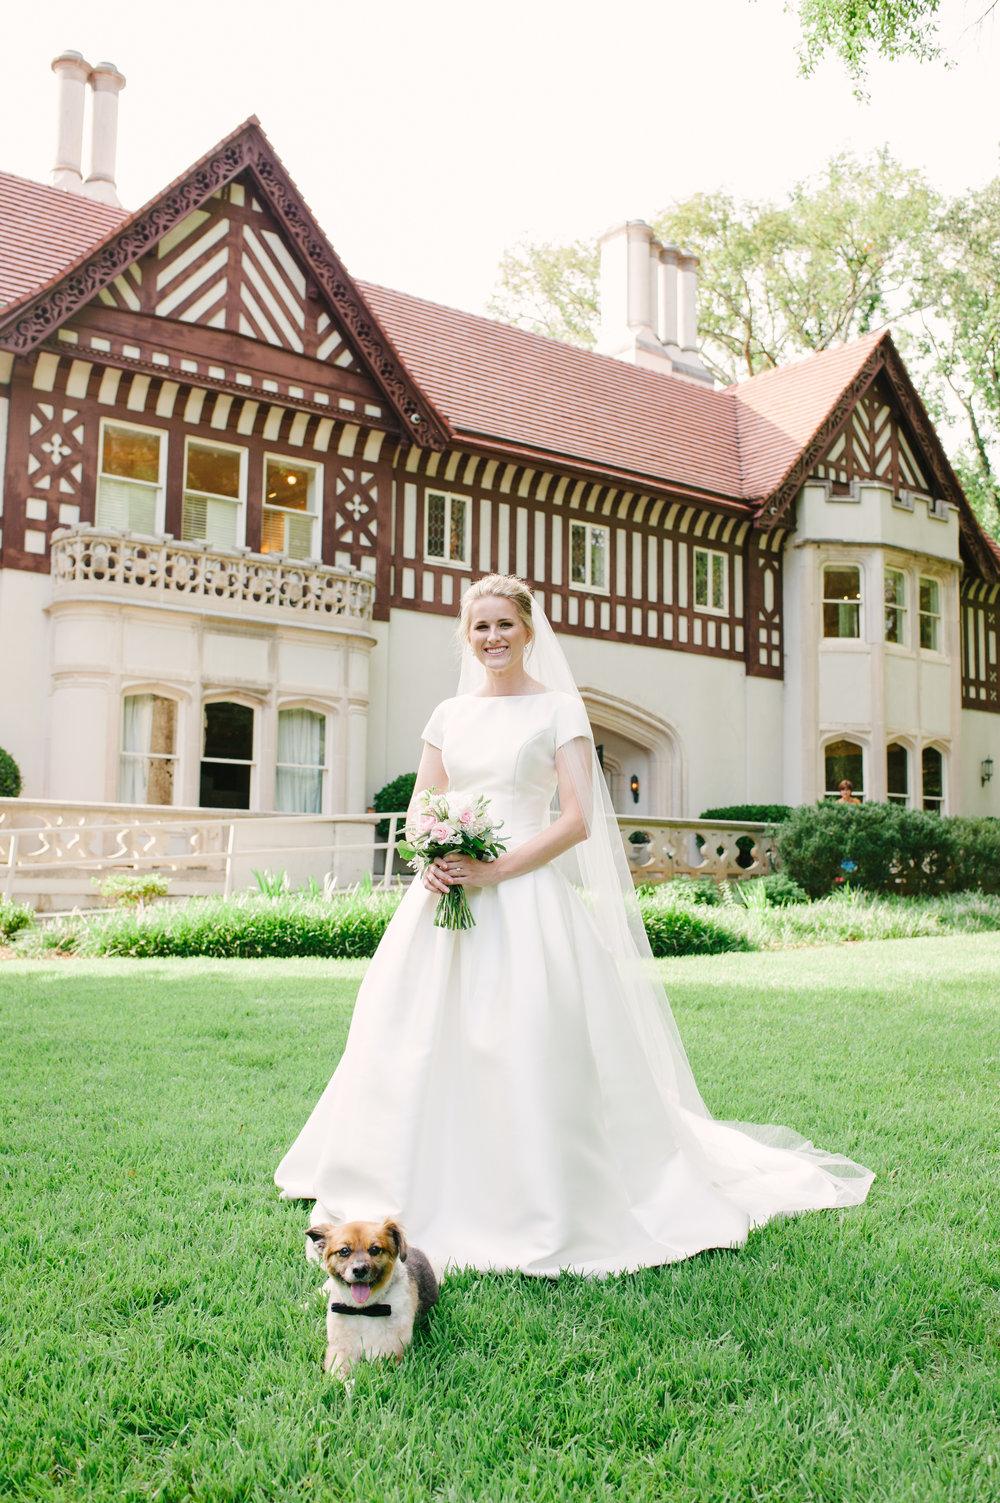 Callanwolde Fine Arts Center Bridal Portrait Session Atlanta-1009.jpg